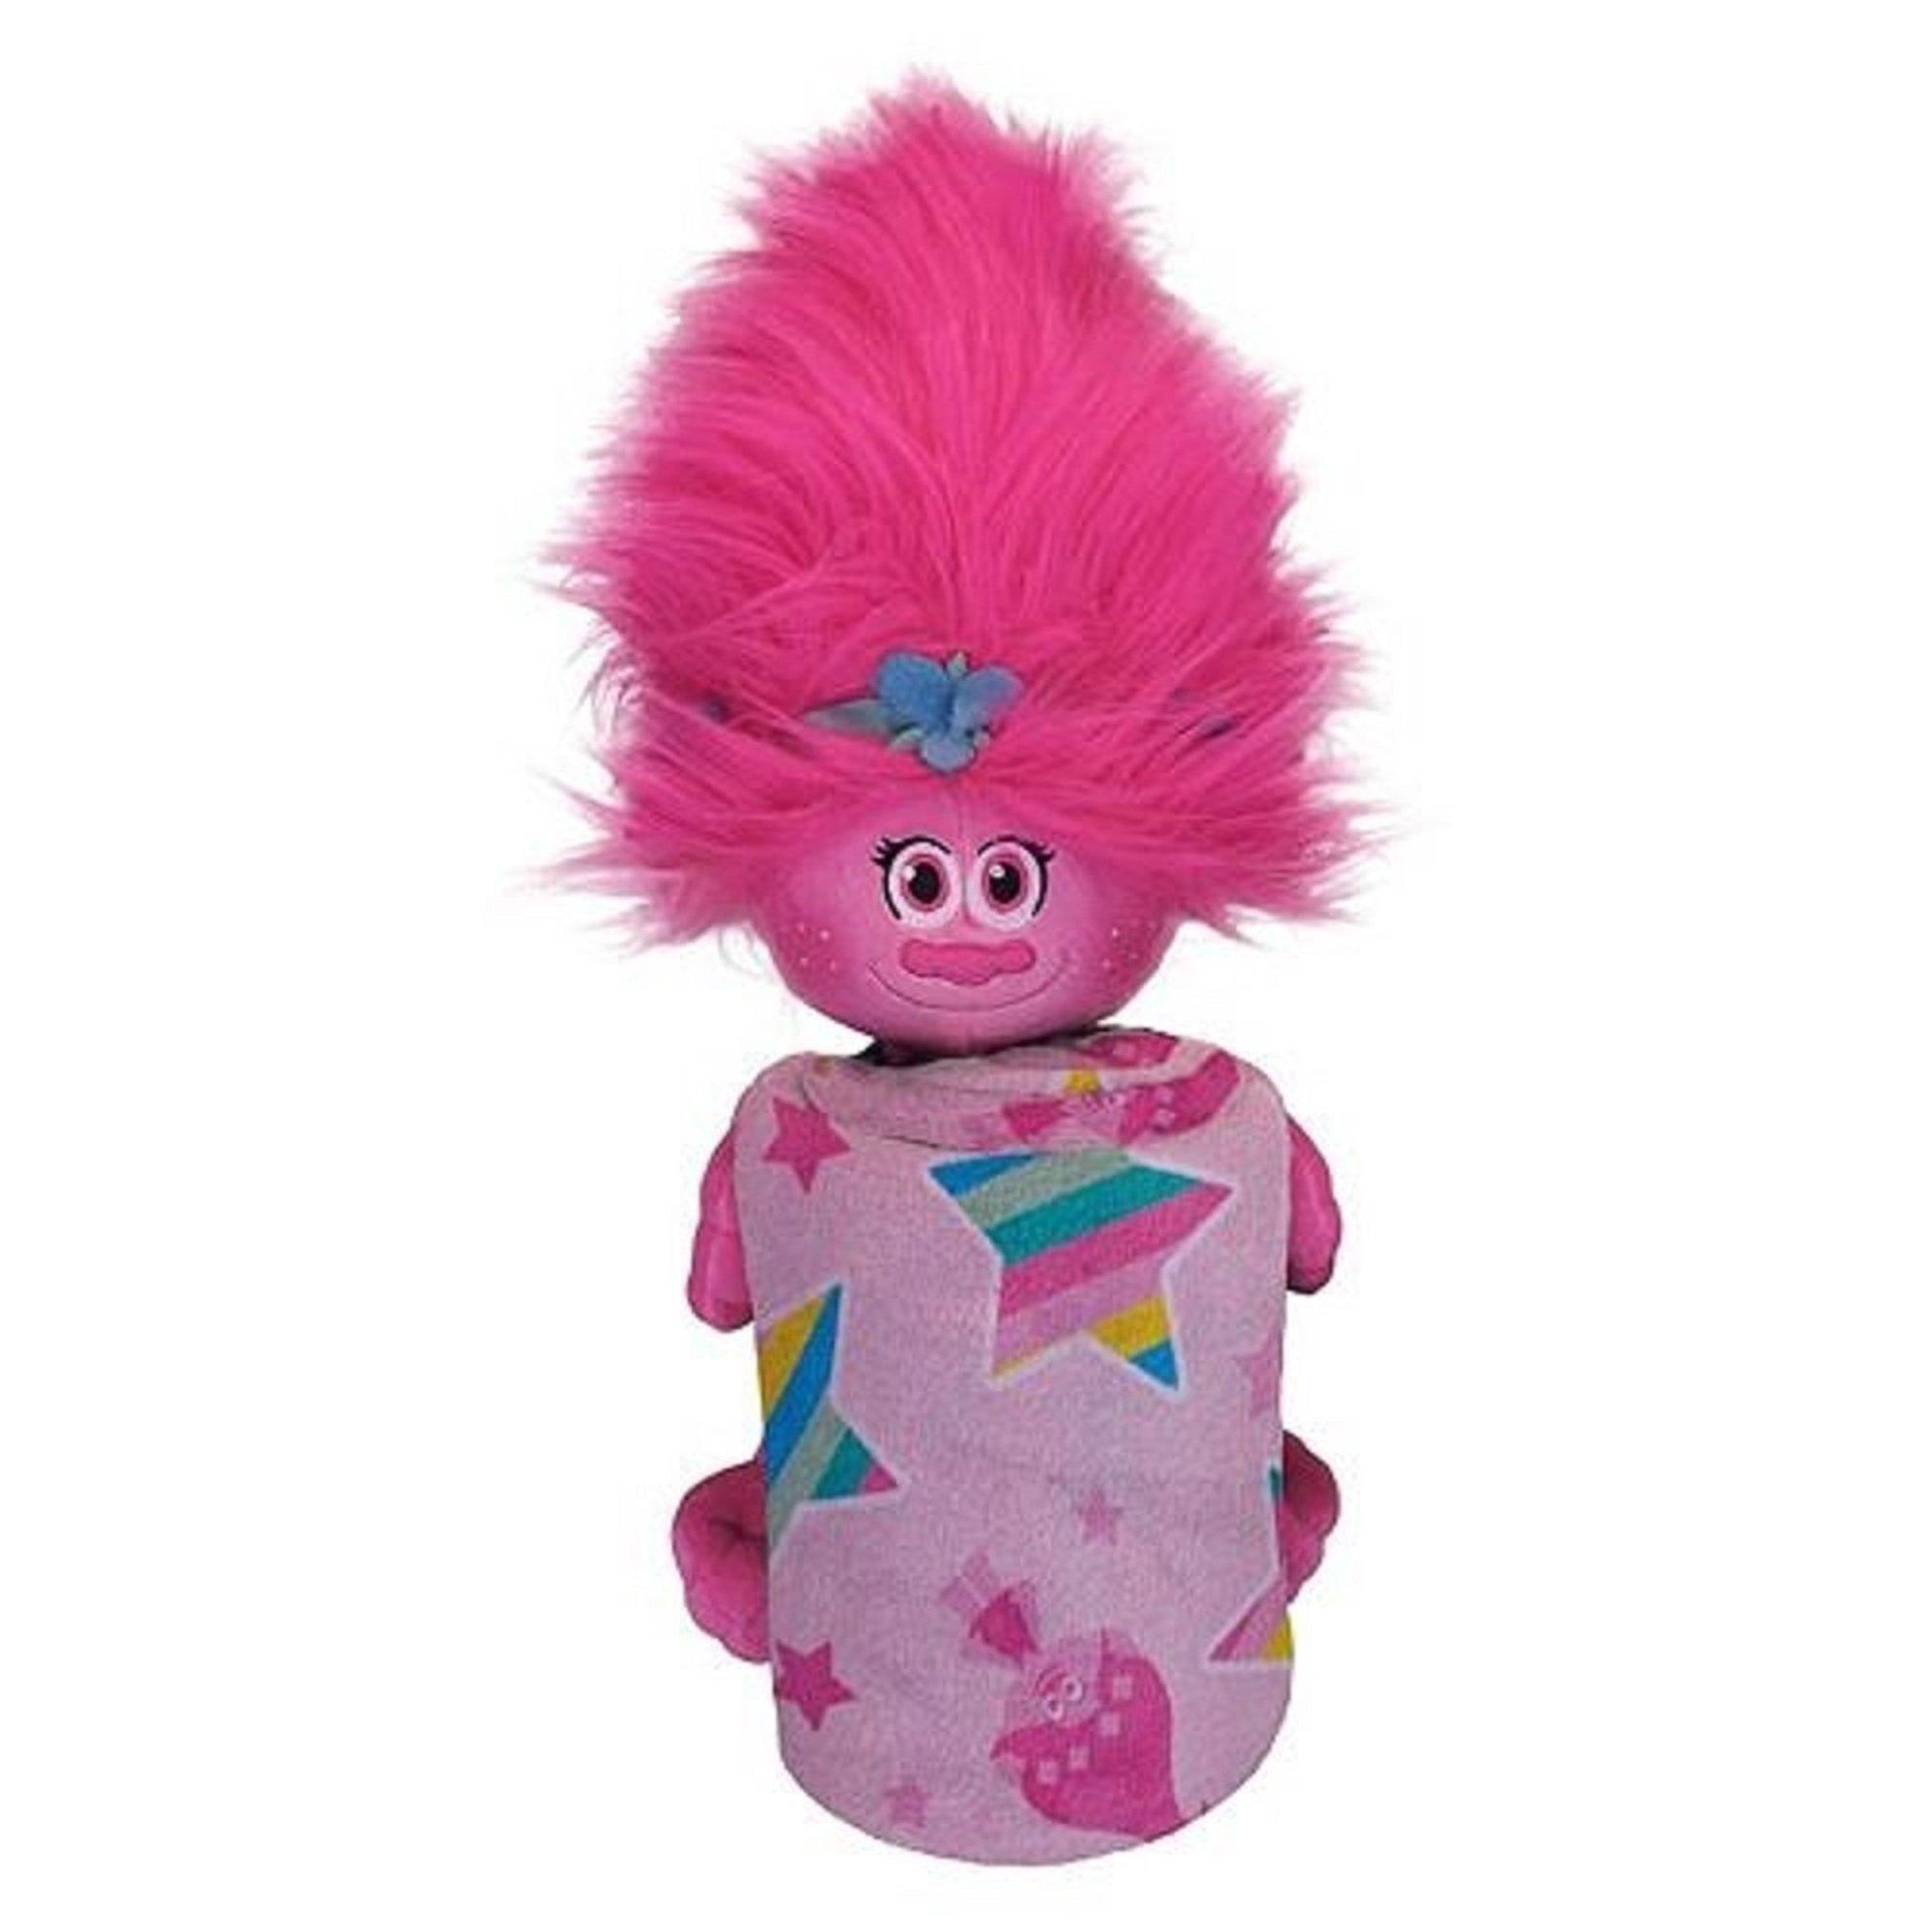 Granny's Best Deals (C) 20'' Trolls Poppy Plush + 40'' x 50'' Trolls Throw-Licensed Product-New!Version2 by Northwest Enterprises